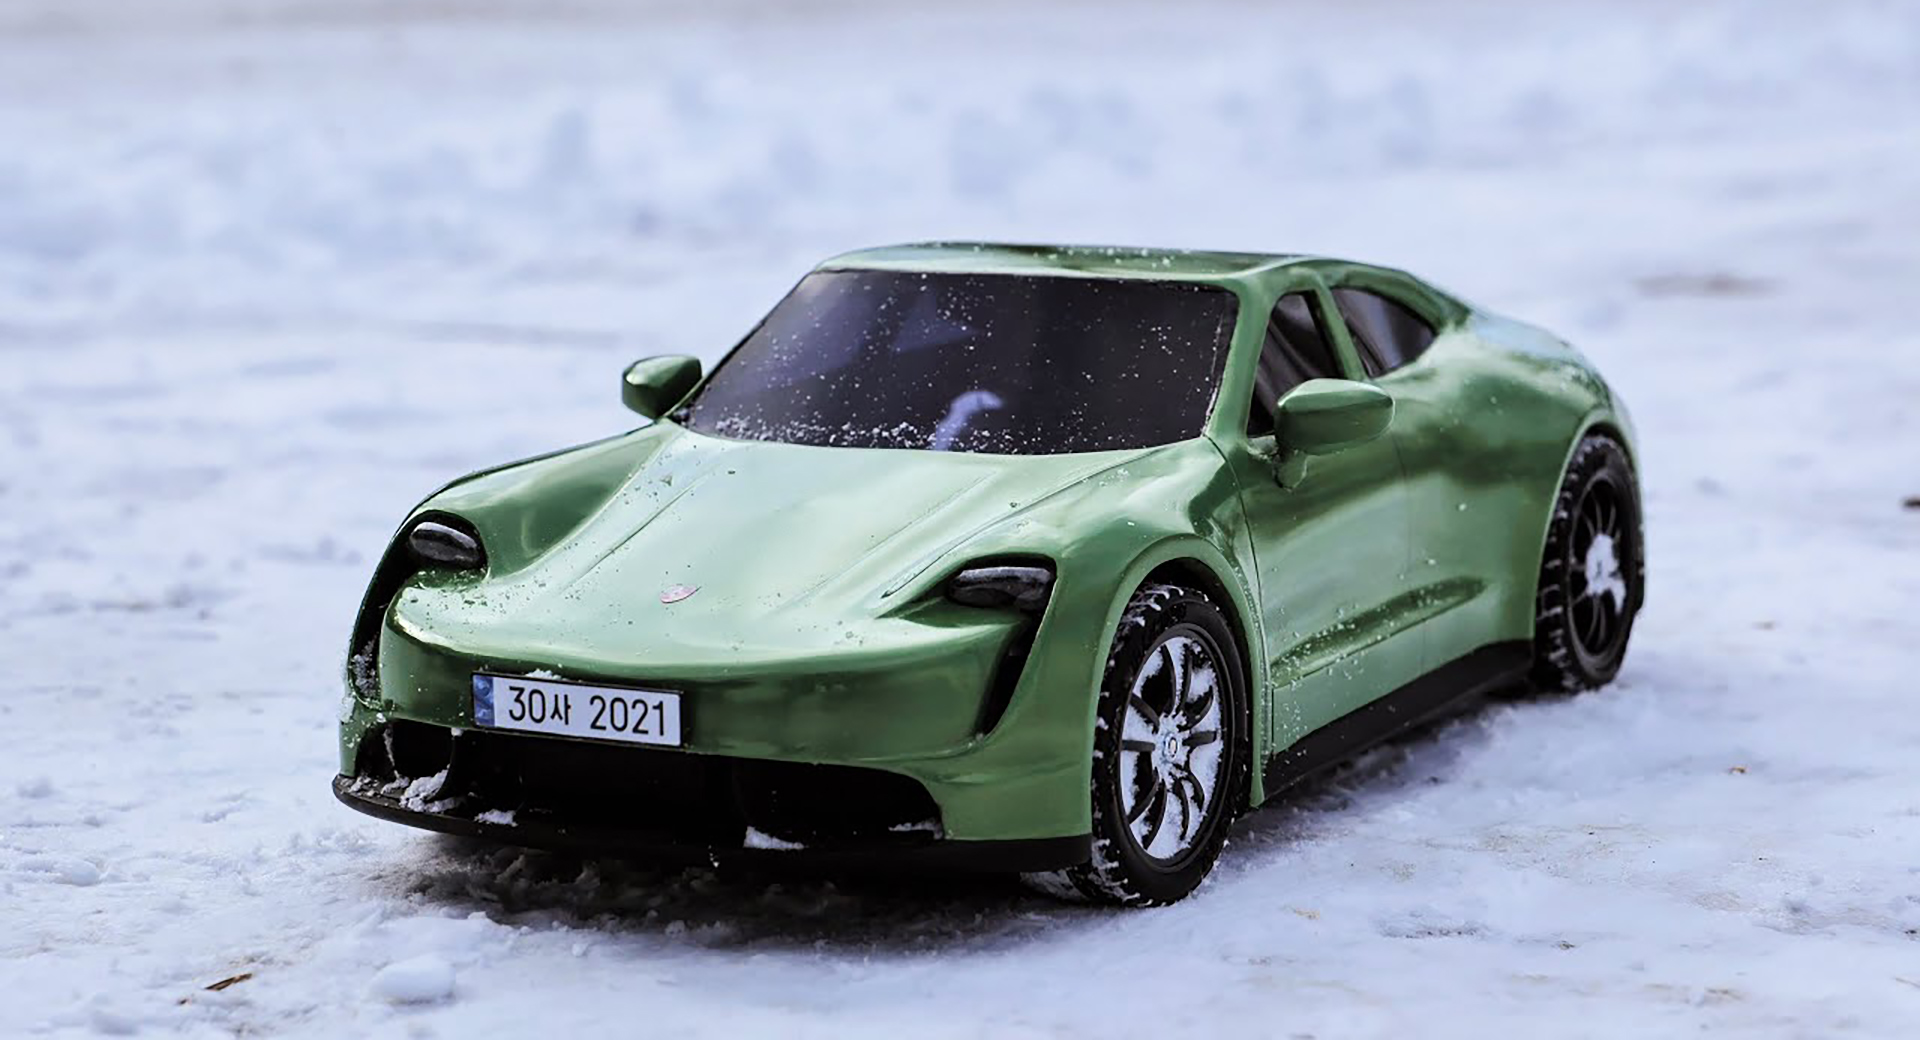 Watch this artist create a Porsche Taycan RC body with a 3D pen